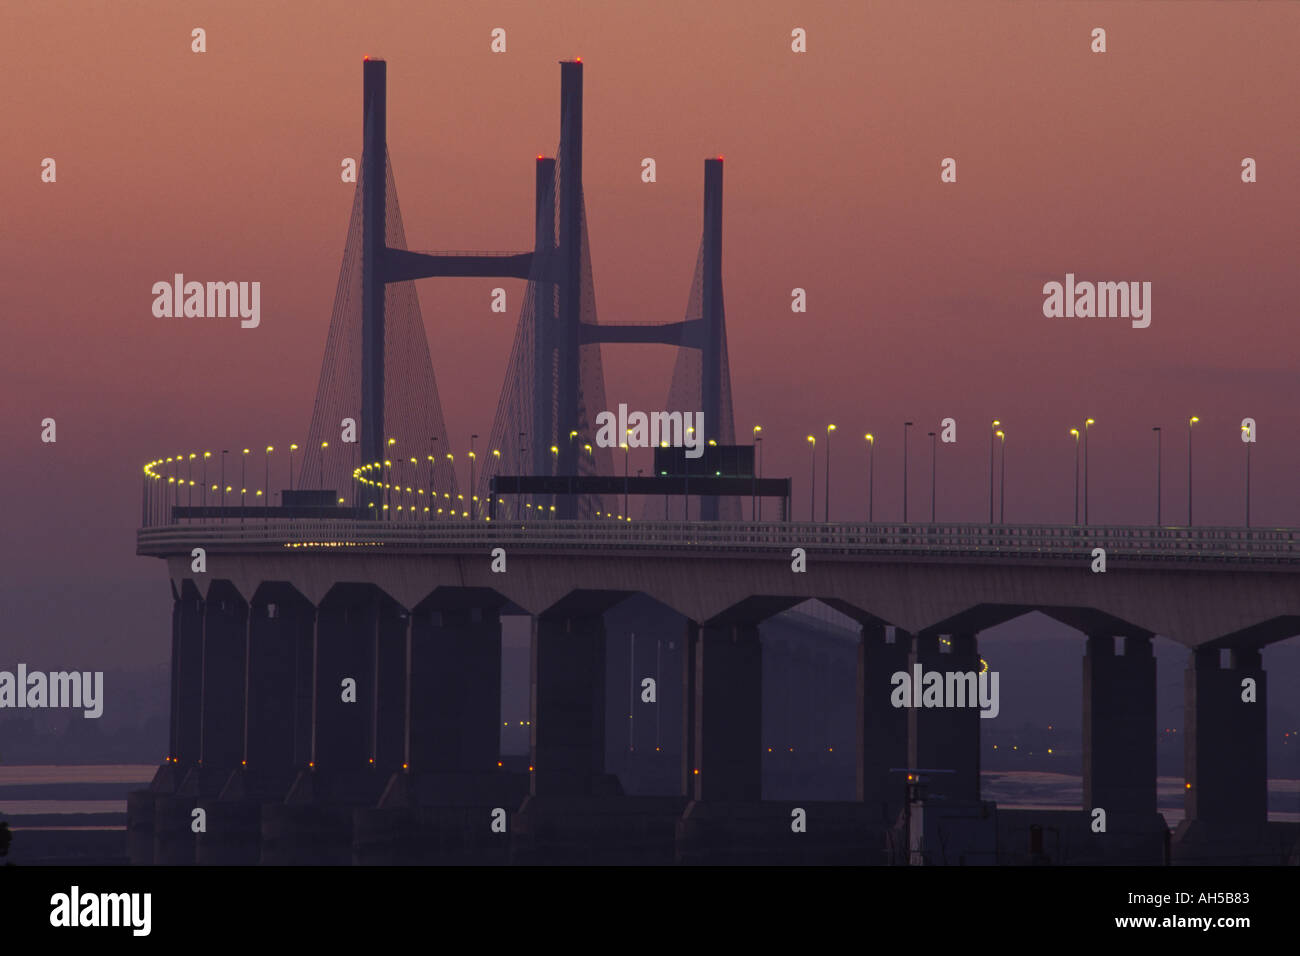 New Severn Bridge at sunset Avon England Stock Photo